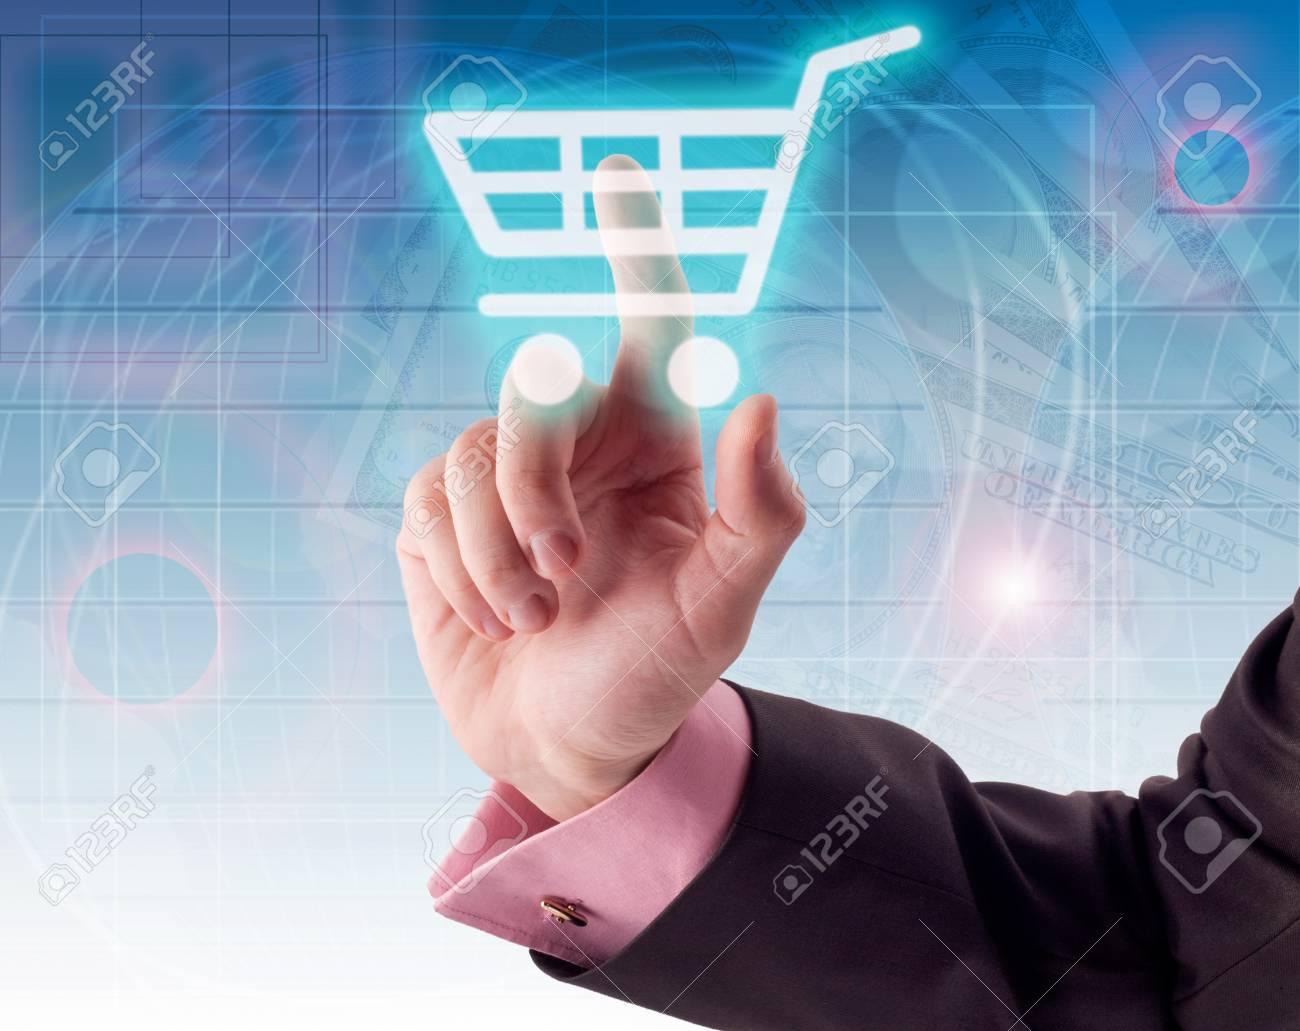 Man hand pressing shopping cart icon Stock Photo - 9700554